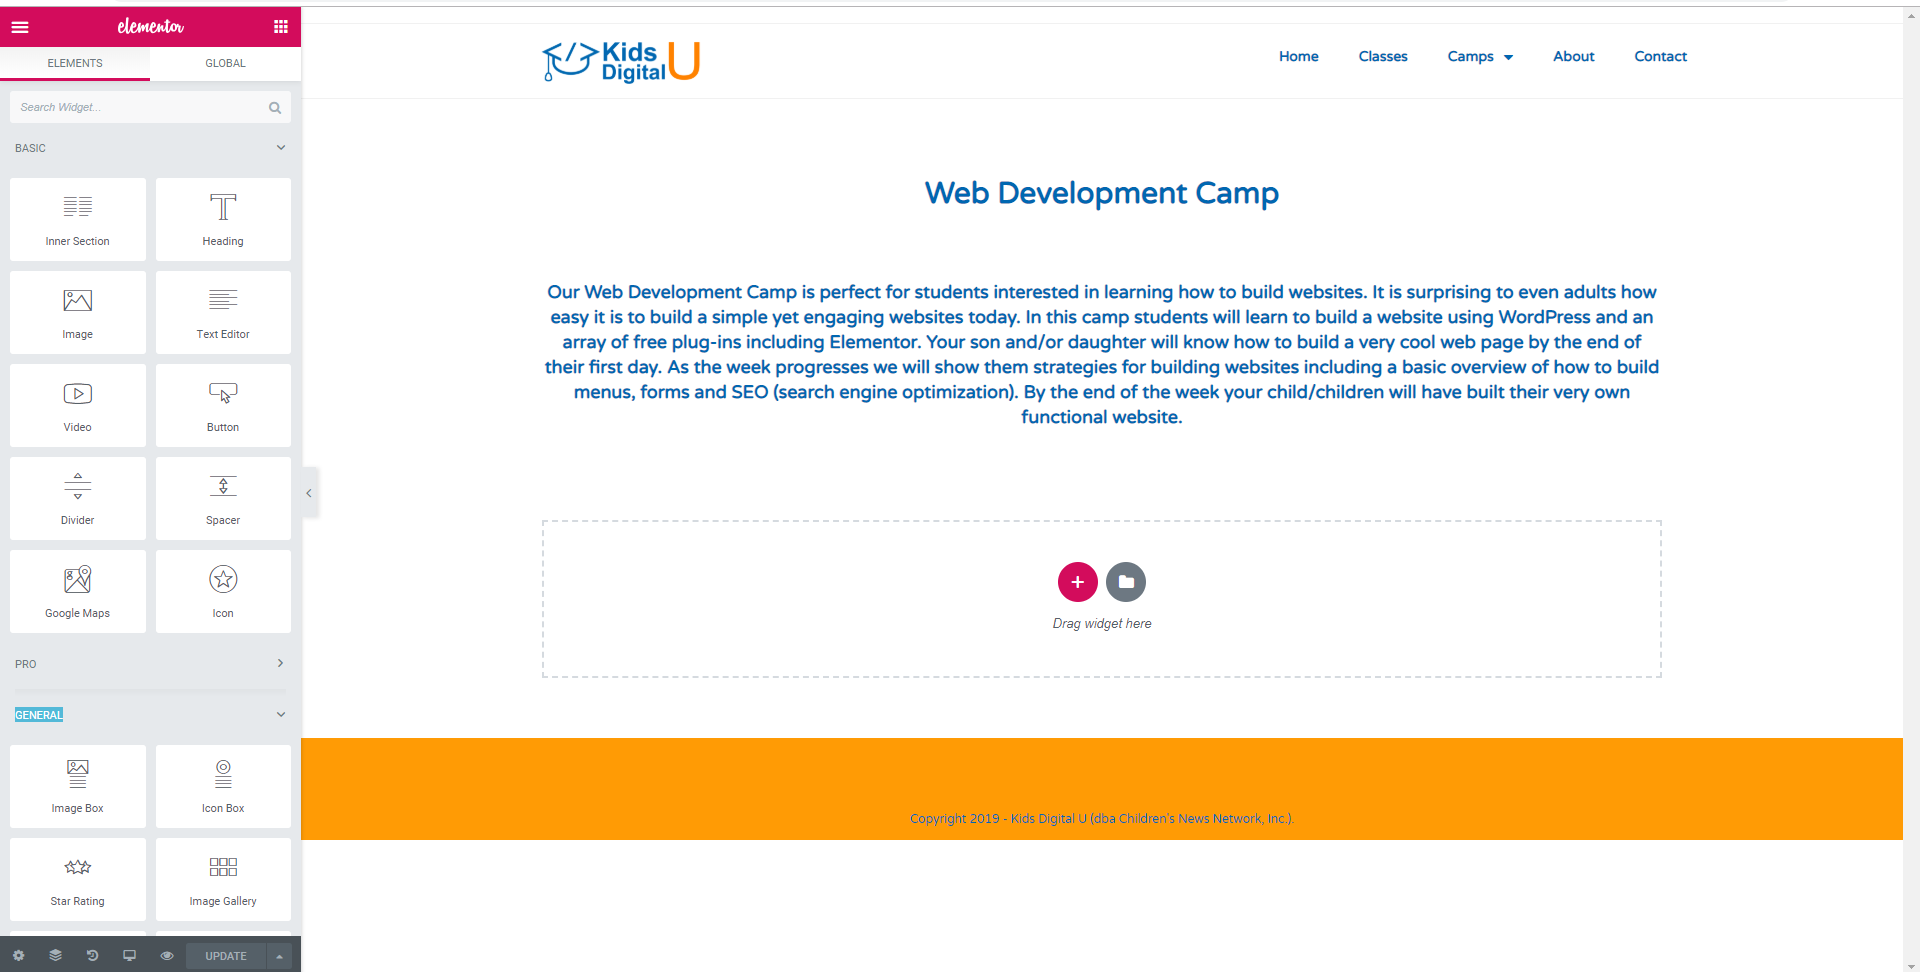 kdu_webdev